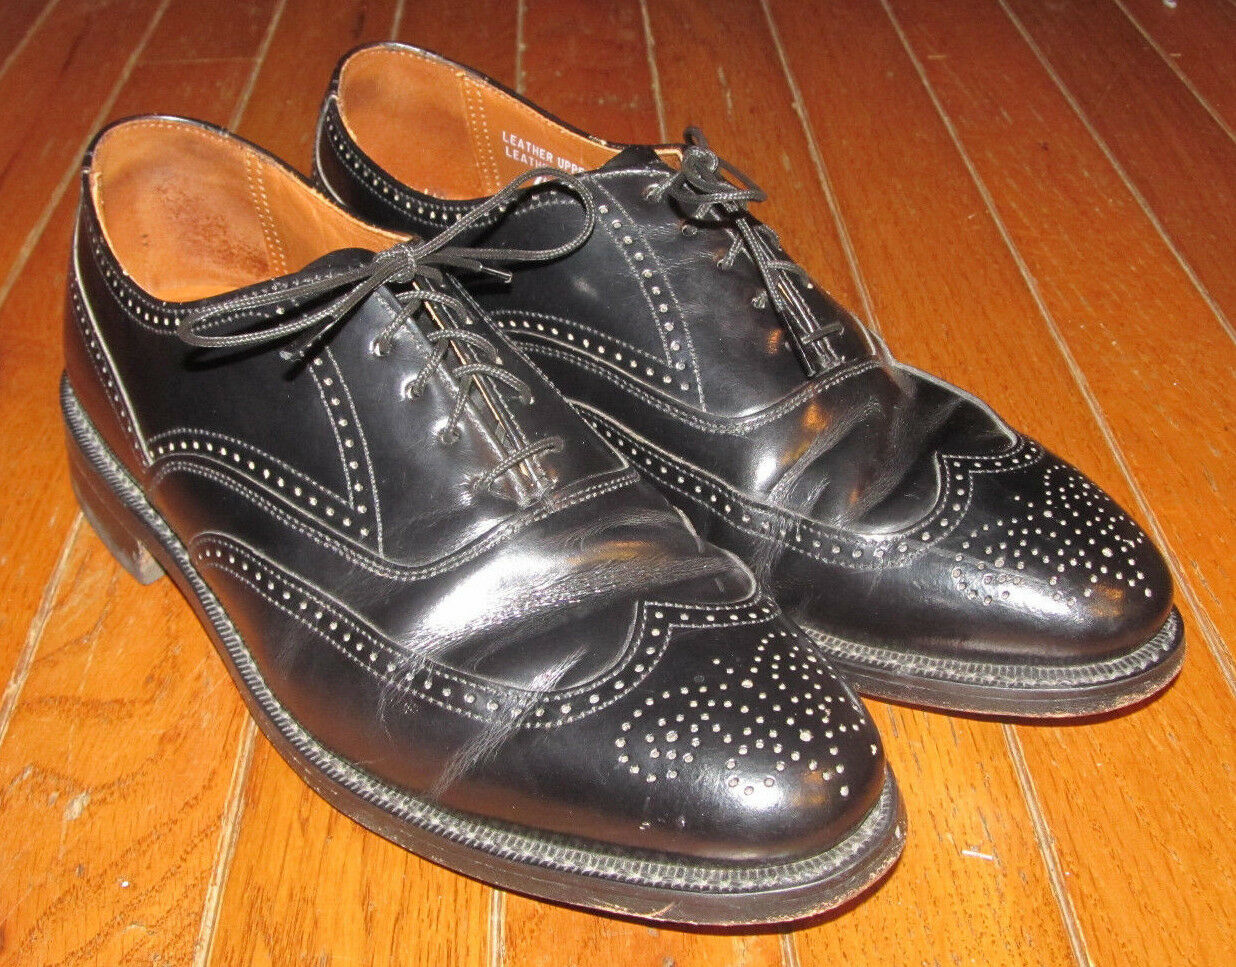 Mens Bostonian Classics new shoes Business Professional shoes Size 8 Black